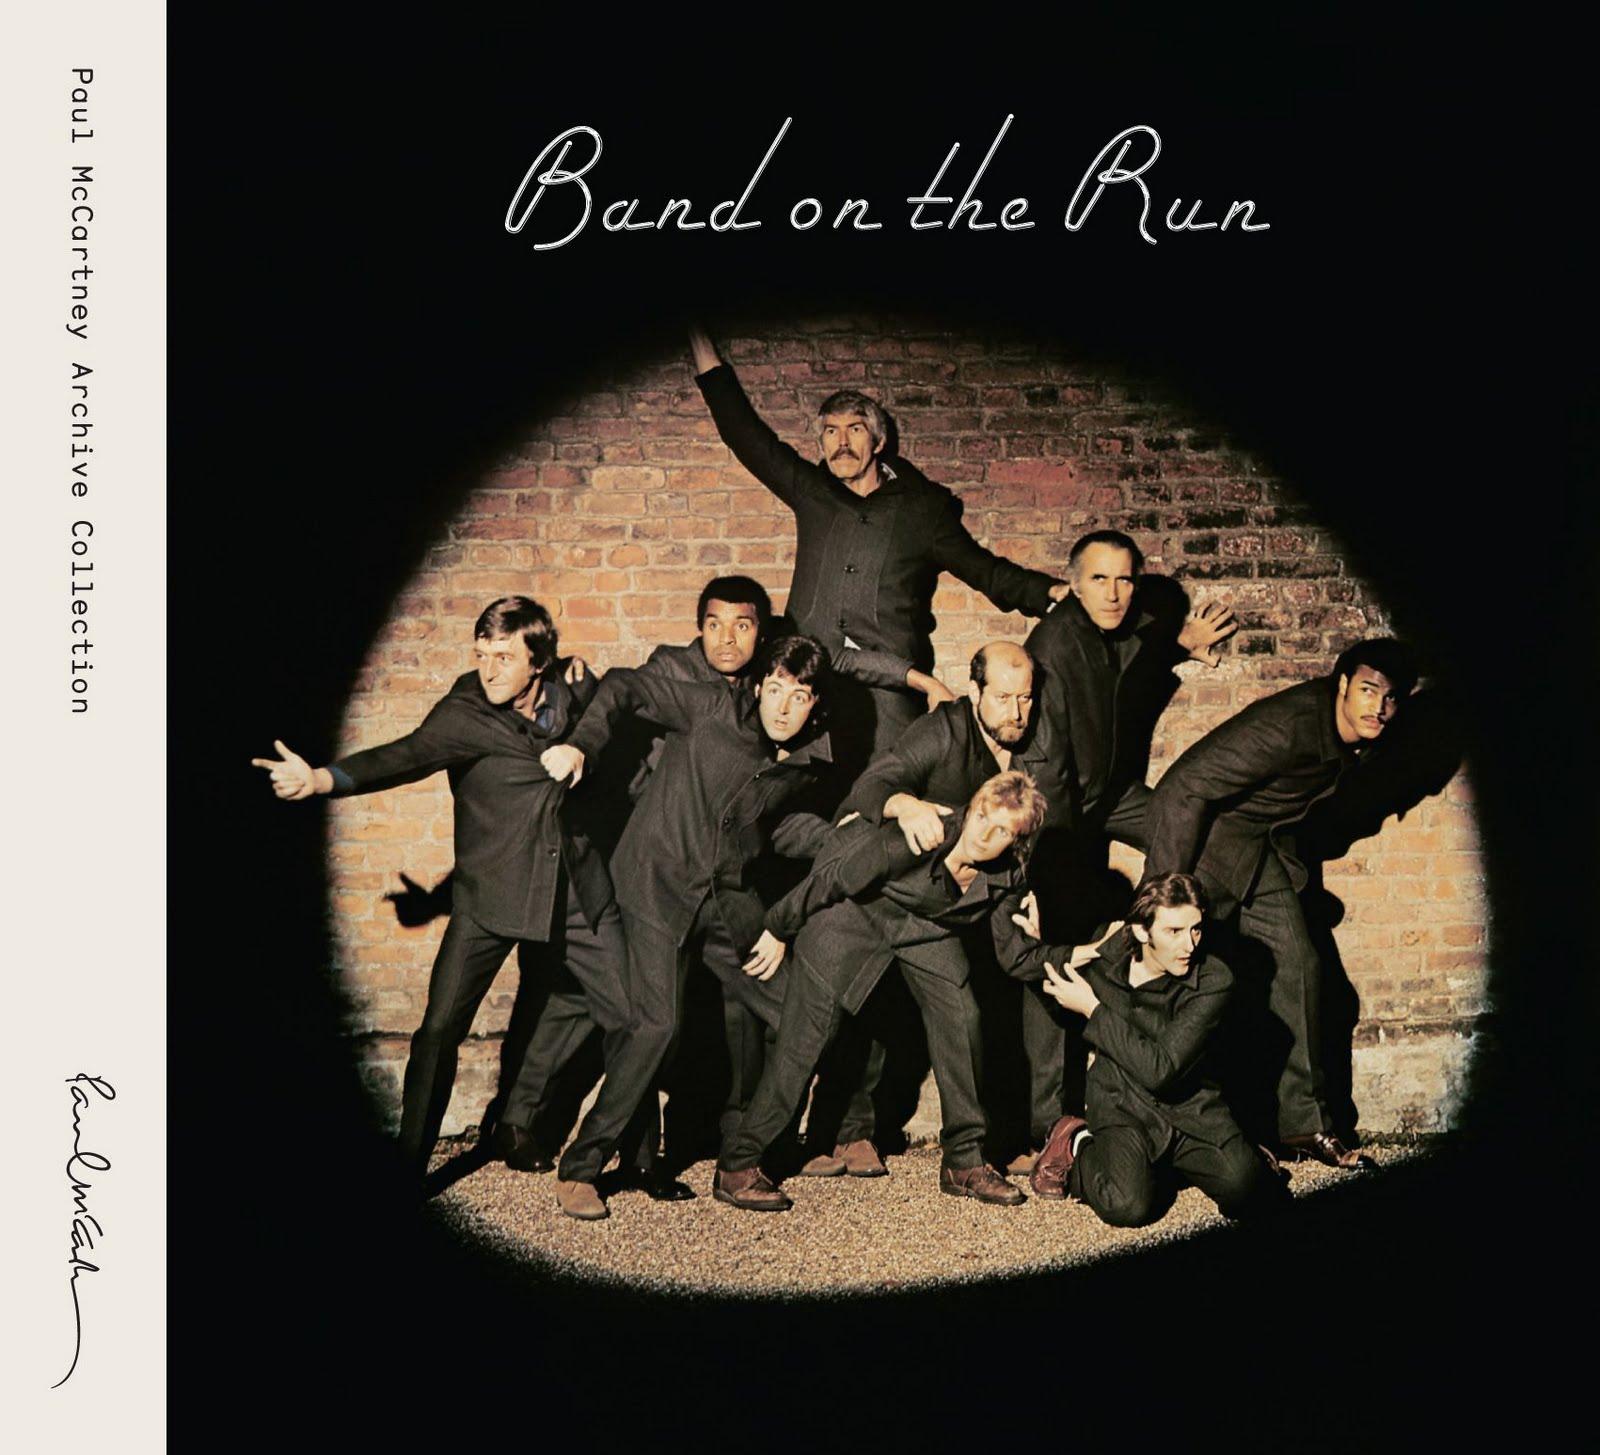 http://1.bp.blogspot.com/_gmWmyujyMA0/TNd2QBqTYcI/AAAAAAAAF6U/Seh_5BNhUBM/s1600/McCartney_BOTR_ArchiveCover.jpg